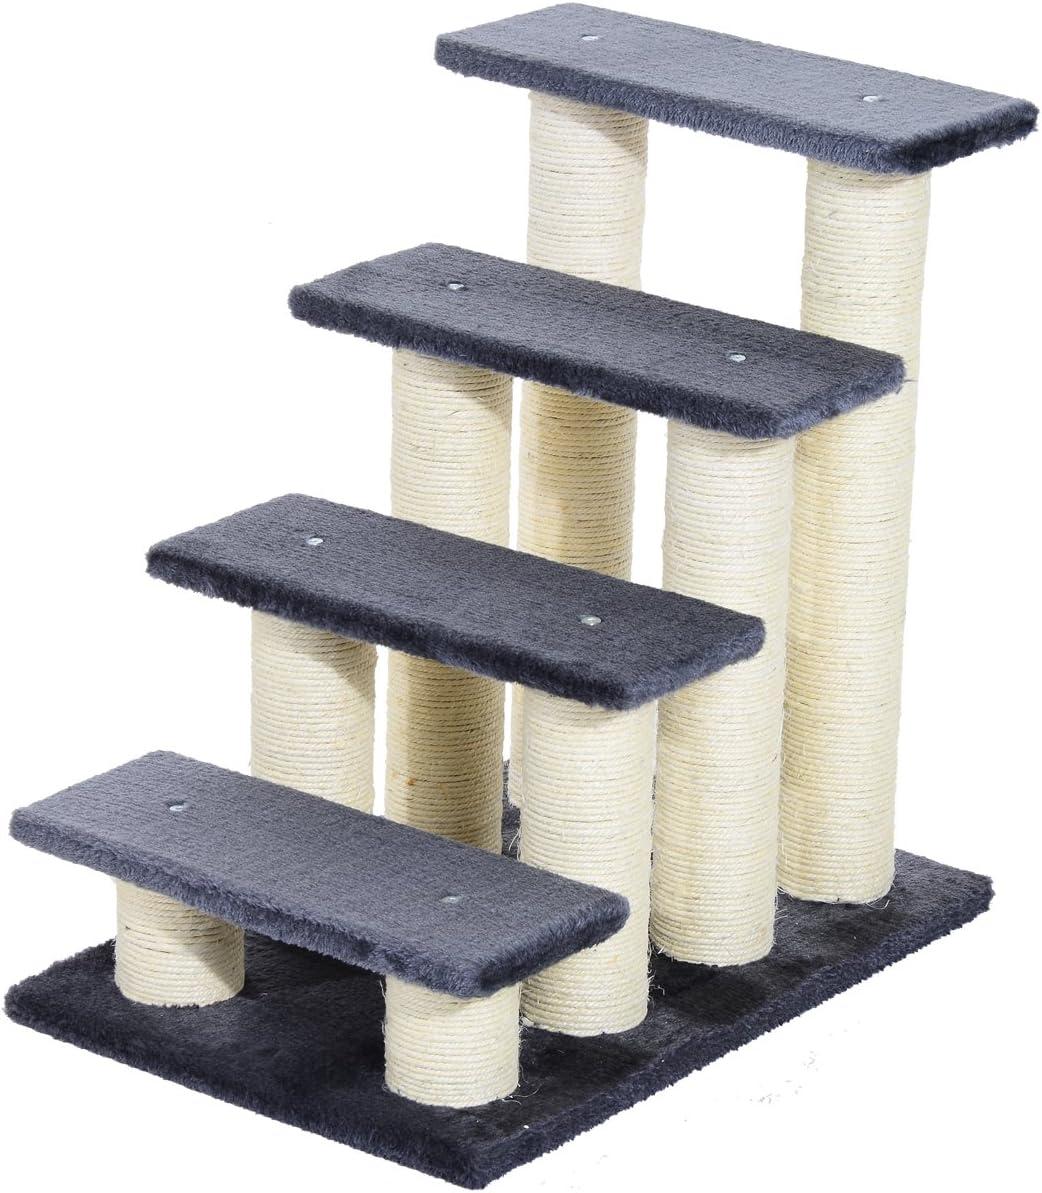 Pawhut Escalera para Mascotas Escalera para Gatos Perros Mayores Enfermos Pequeños Cubierta Suave de Peluche Rascador de Sisal Estable 4 Pasos 60x42x61 cm Gris